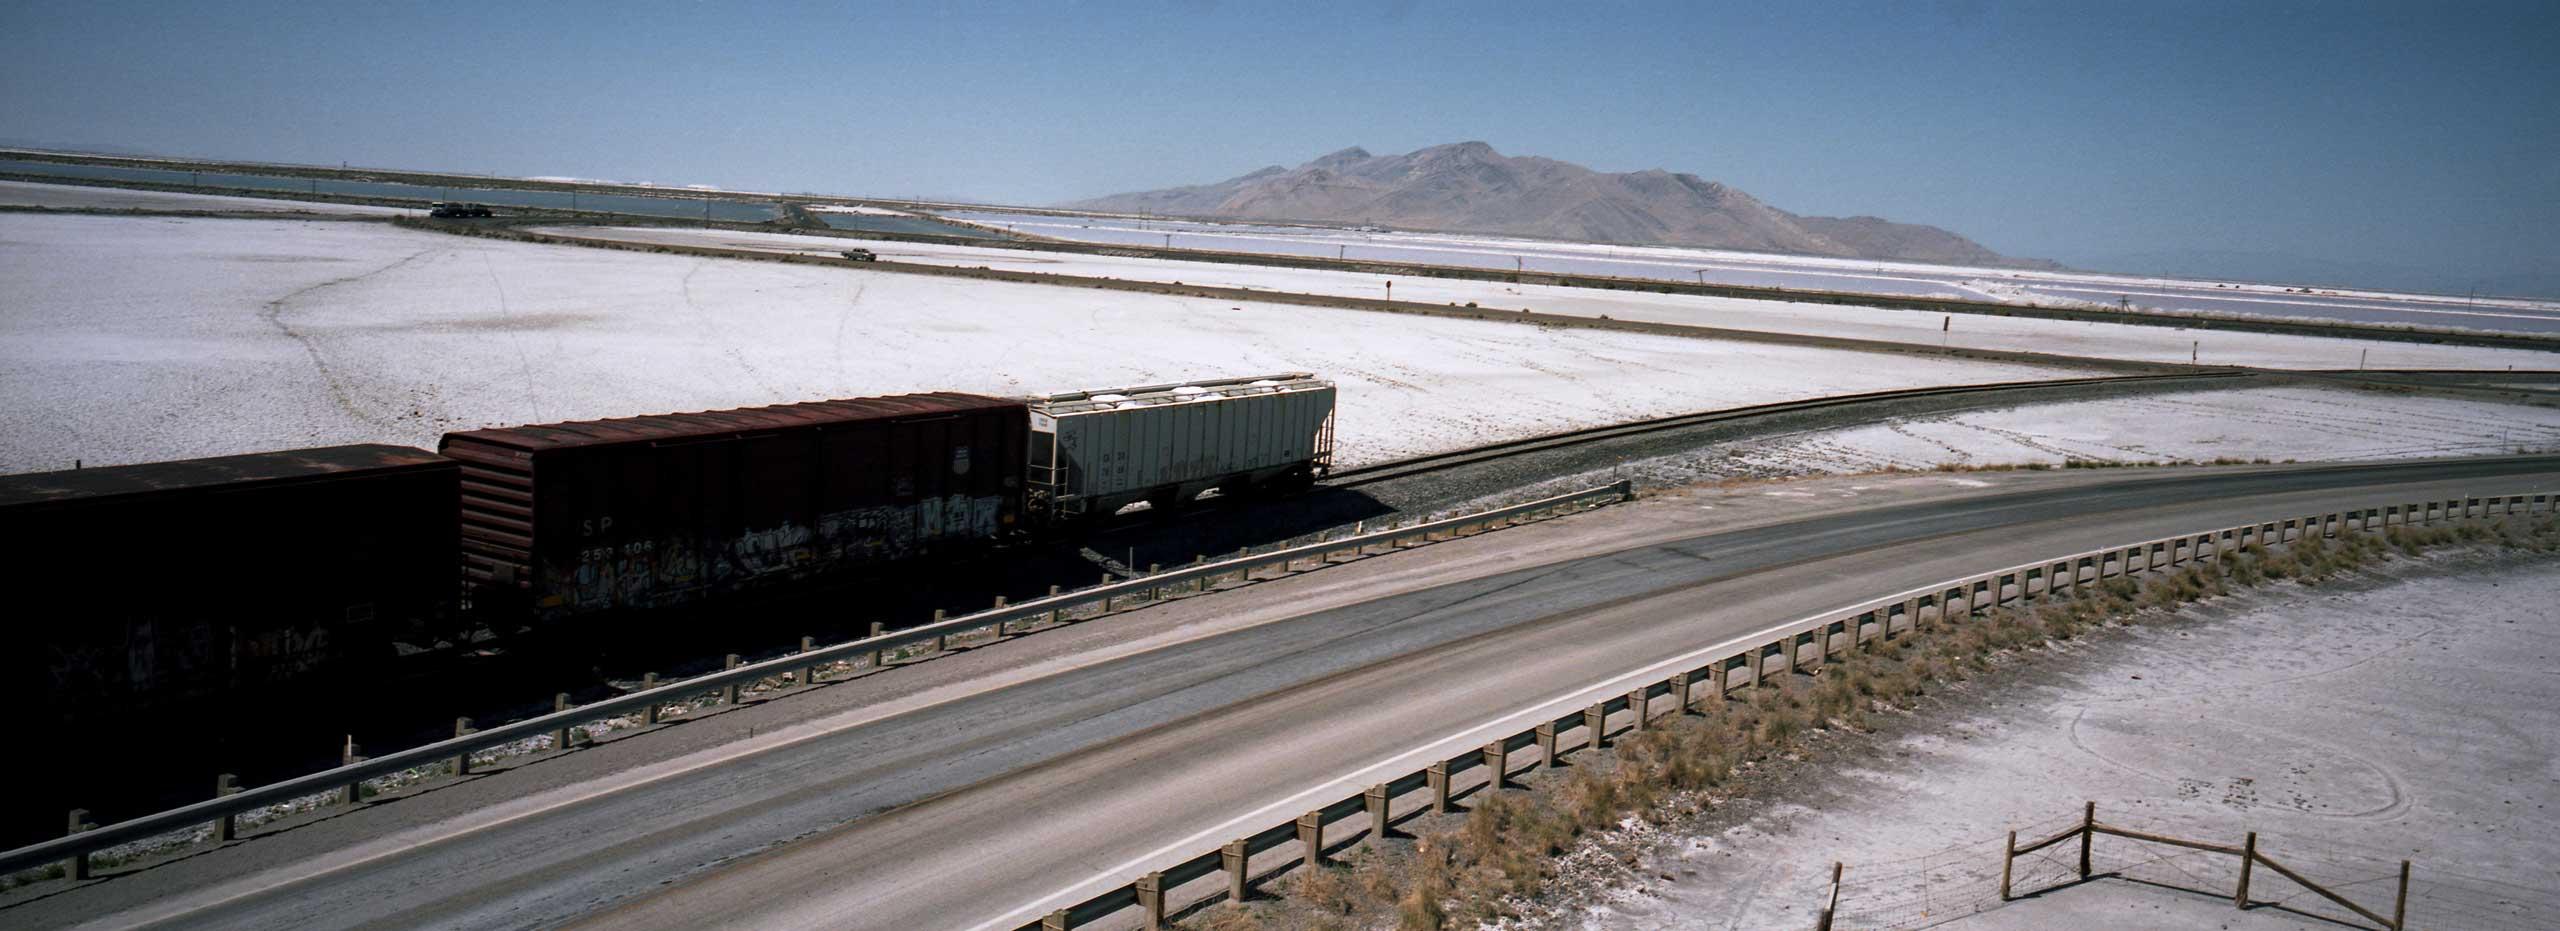 Cargo trains loaded with Salt. Salt Mines. Utah. July 2012